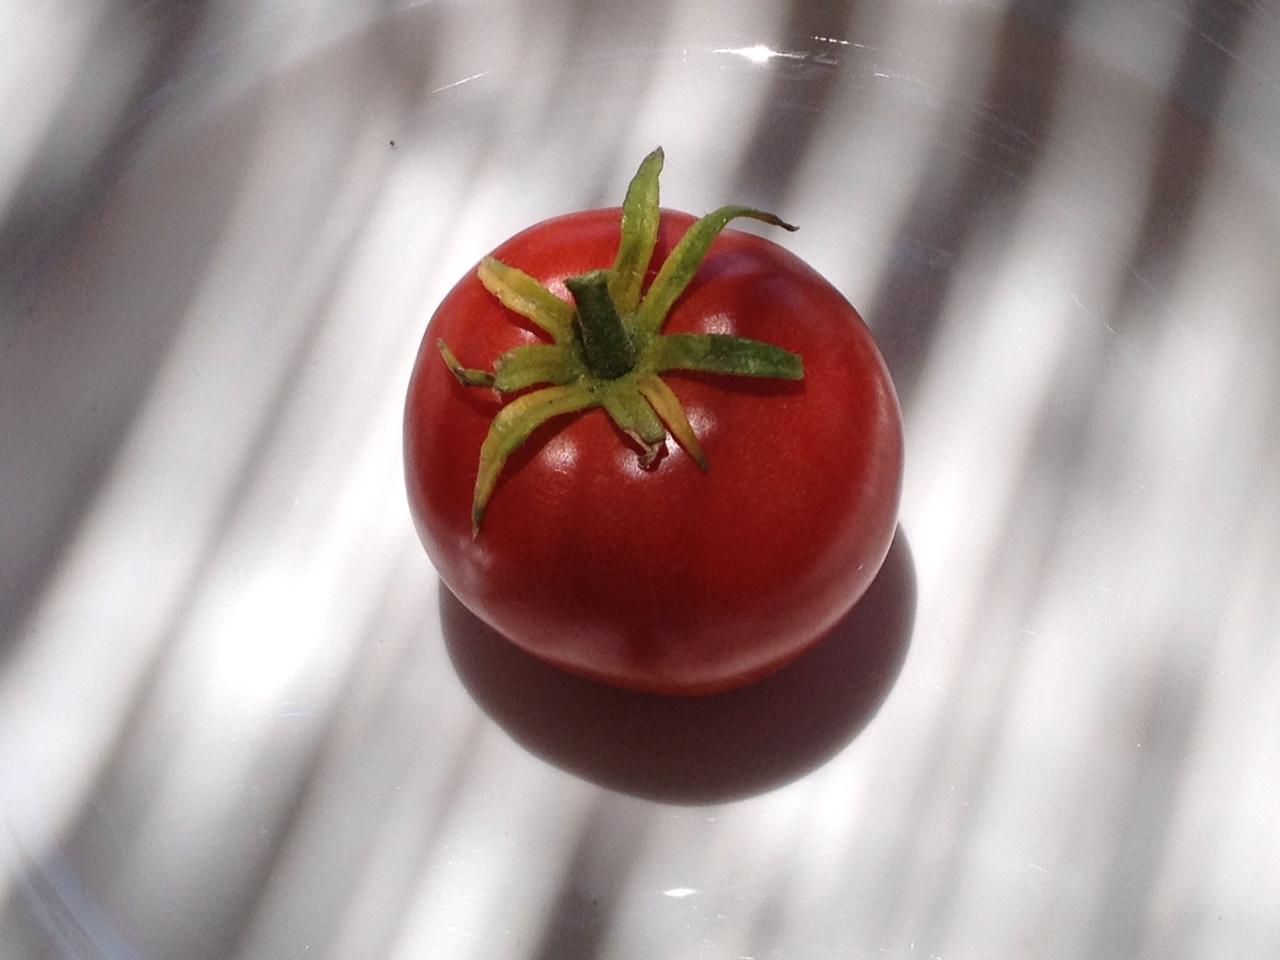 2013-07-08-tomato1.JPG